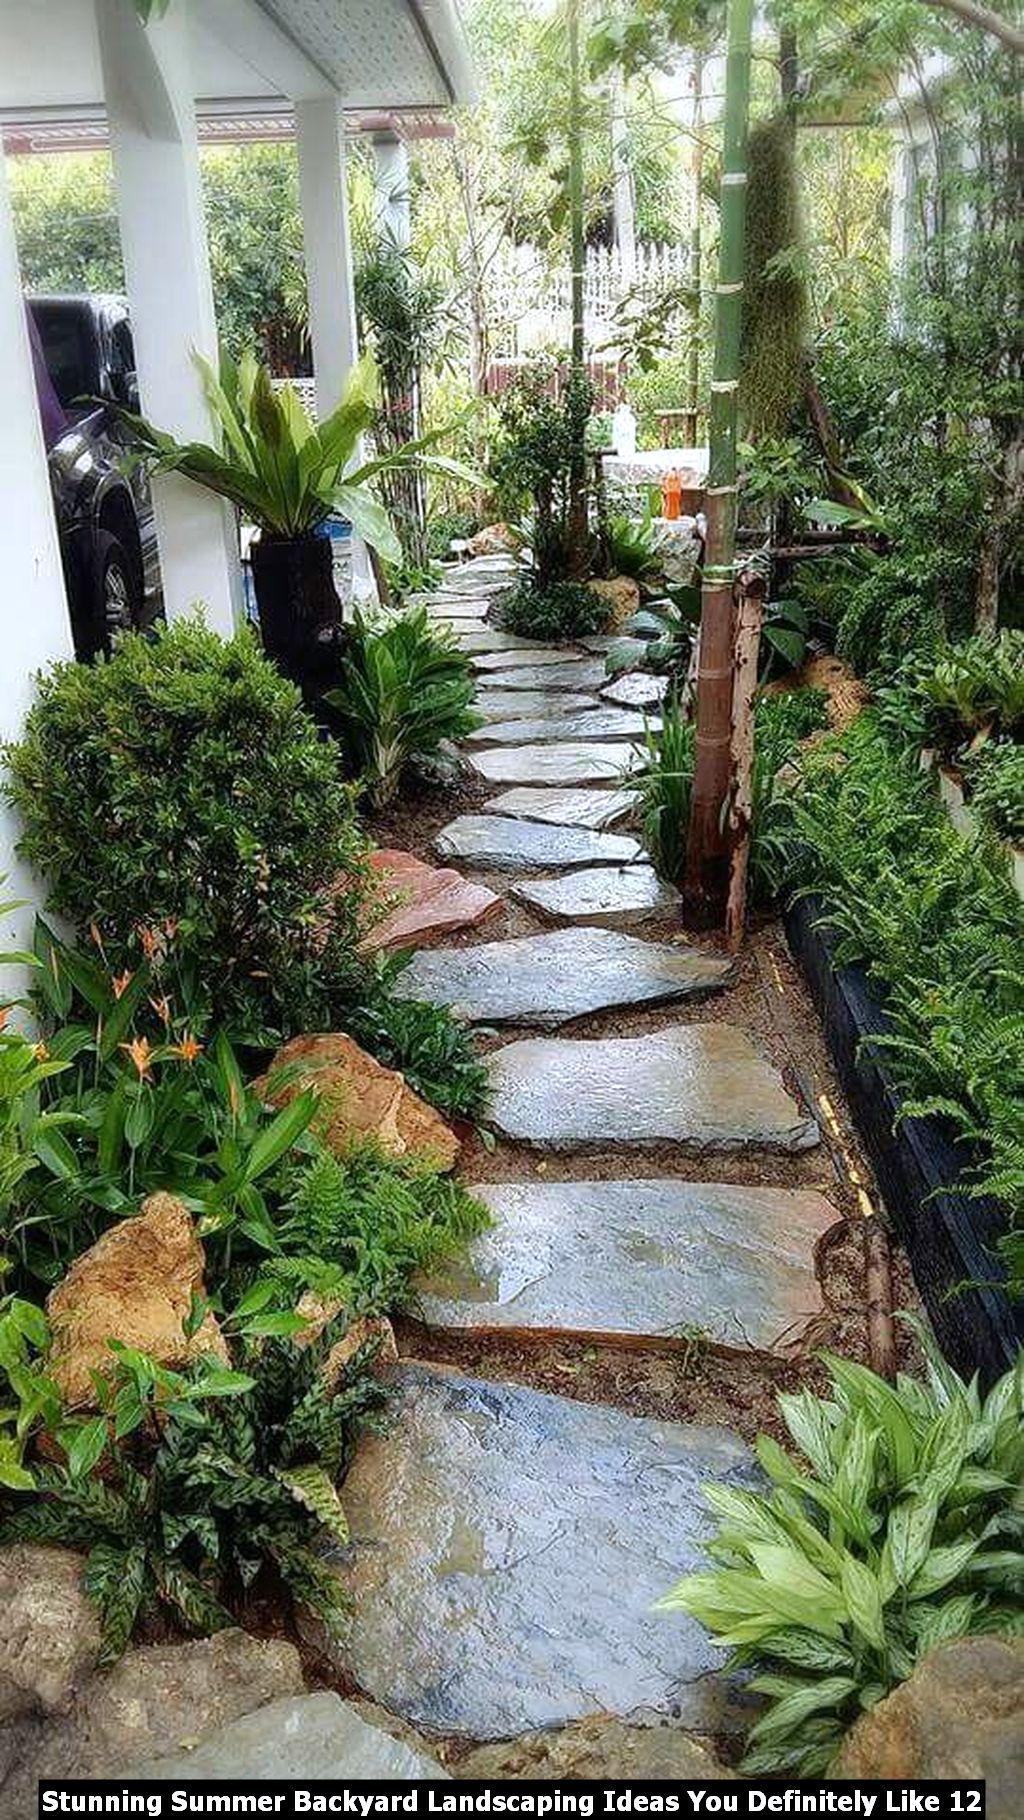 Stunning Summer Backyard Landscaping Ideas You Definitely Like 12